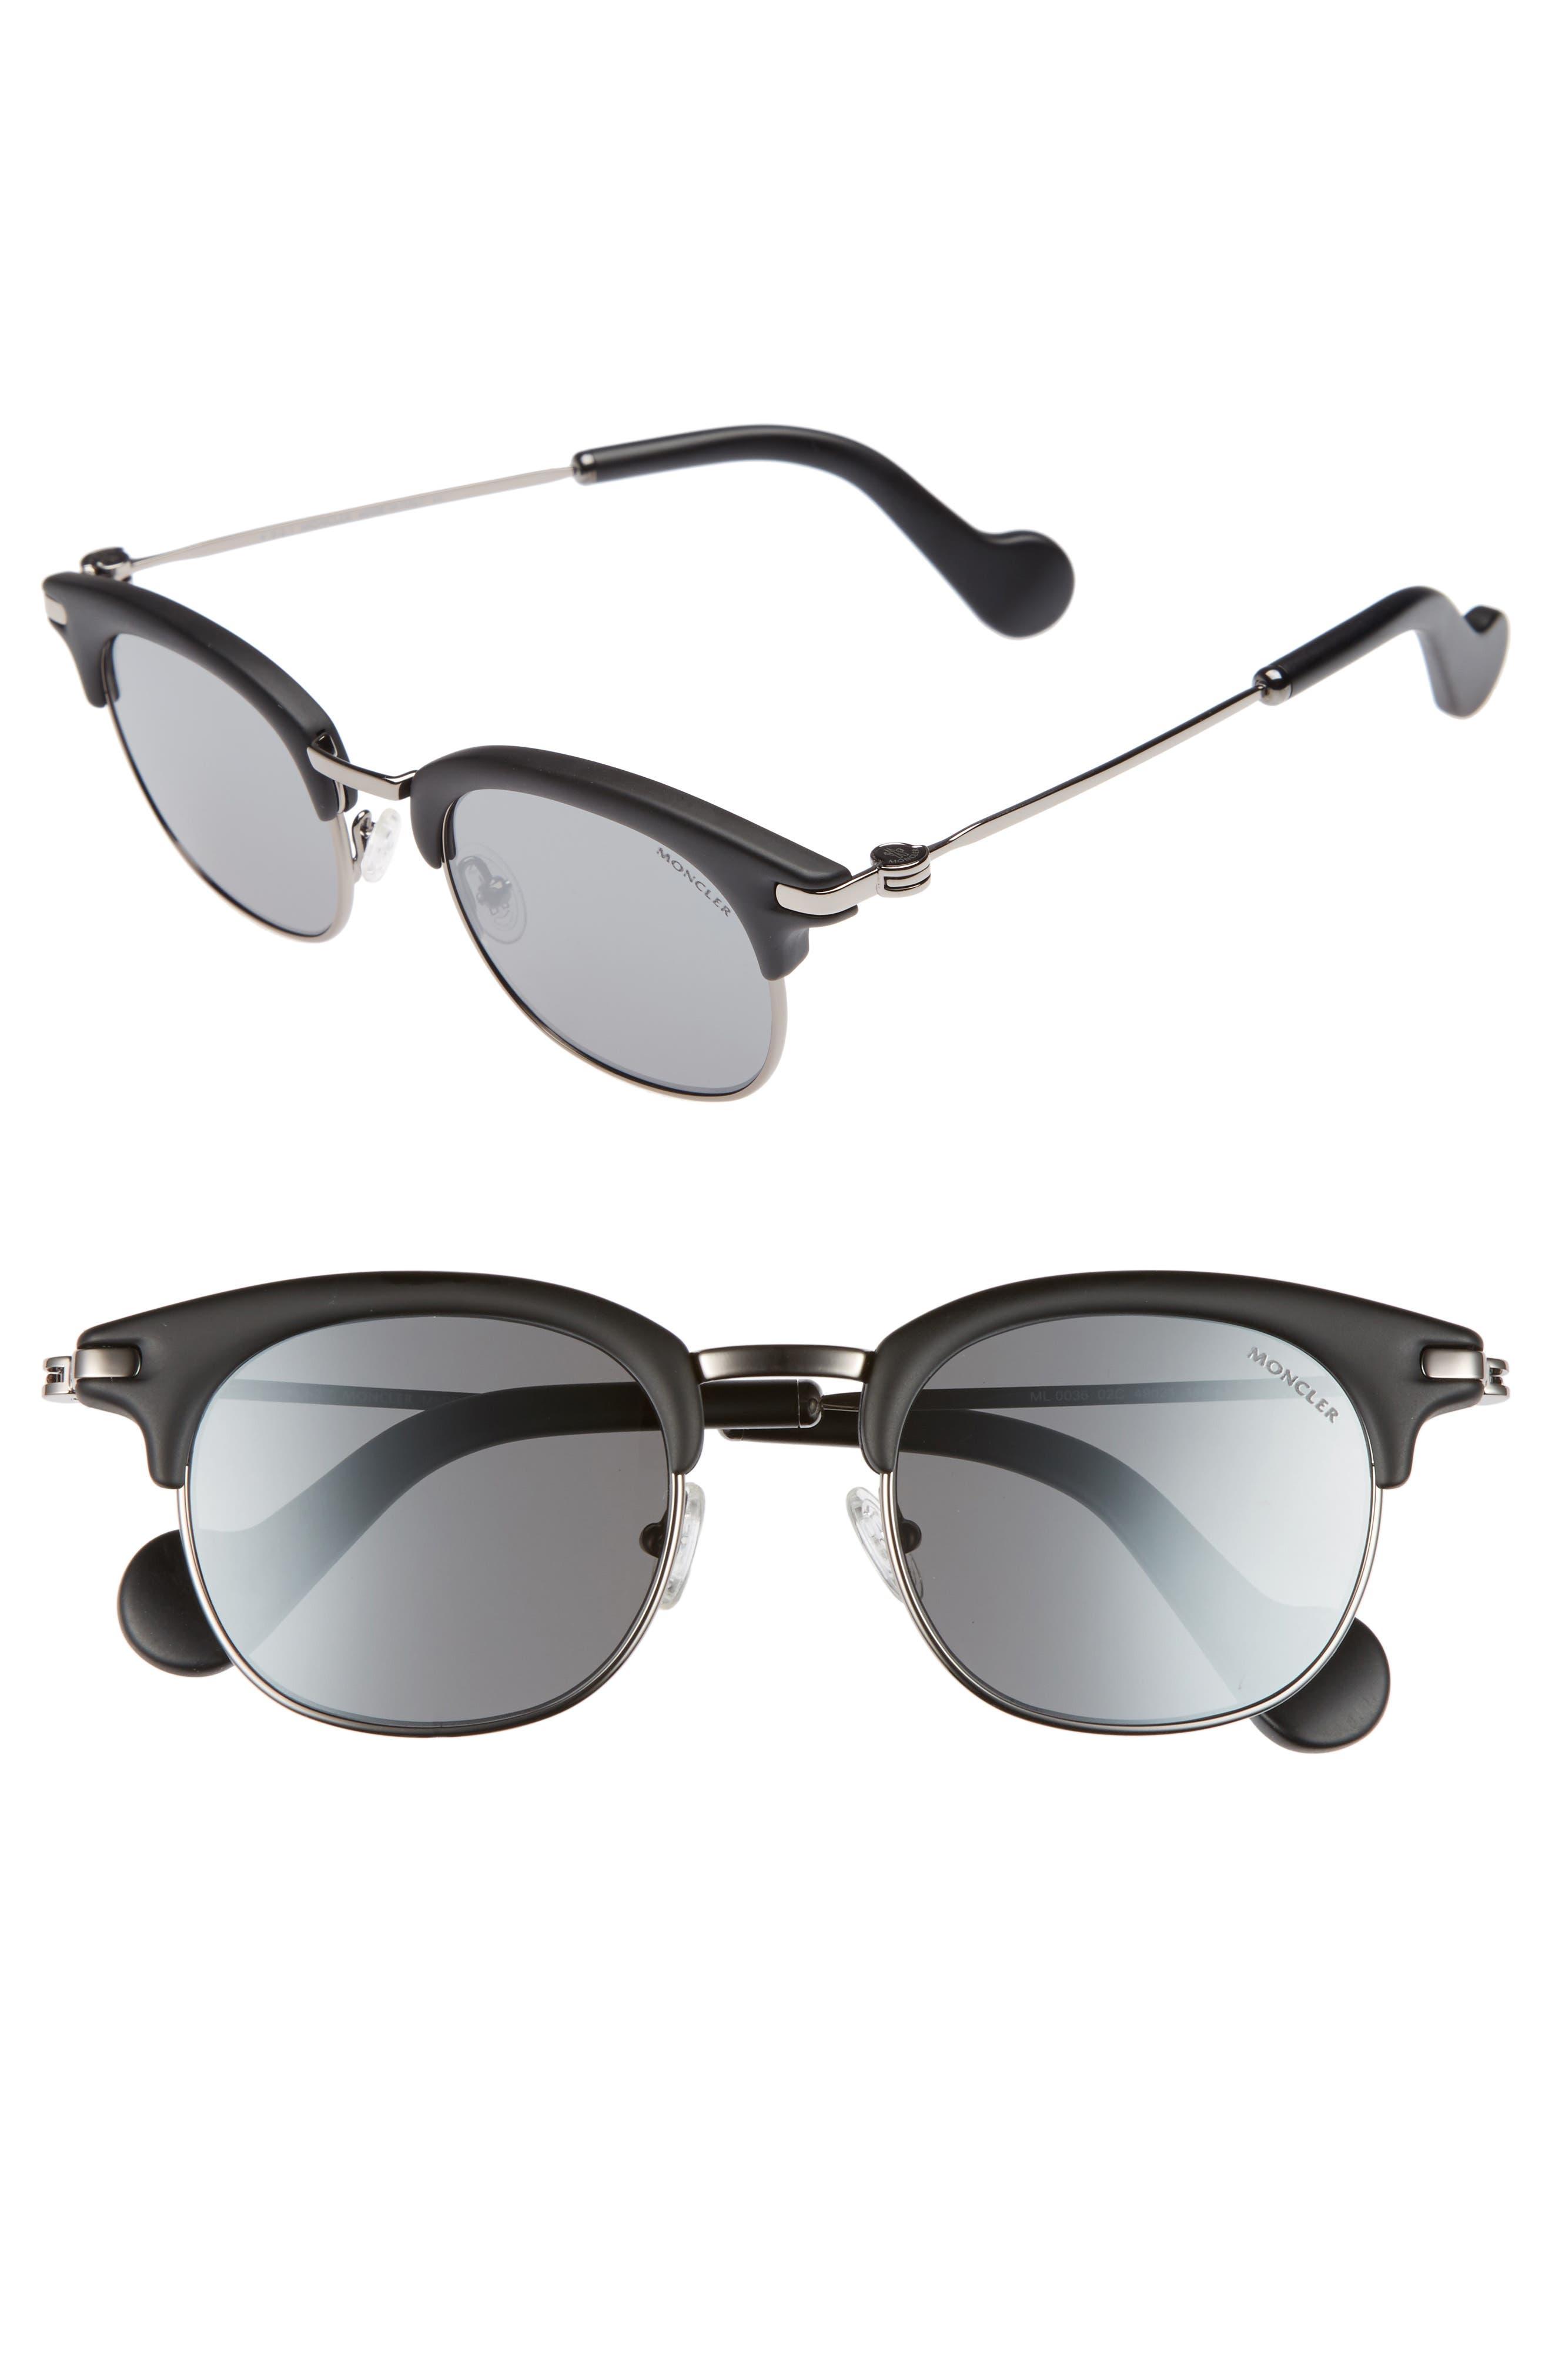 49mm Sunglasses,                         Main,                         color, MATTE BLACK/ RUTHENIUM